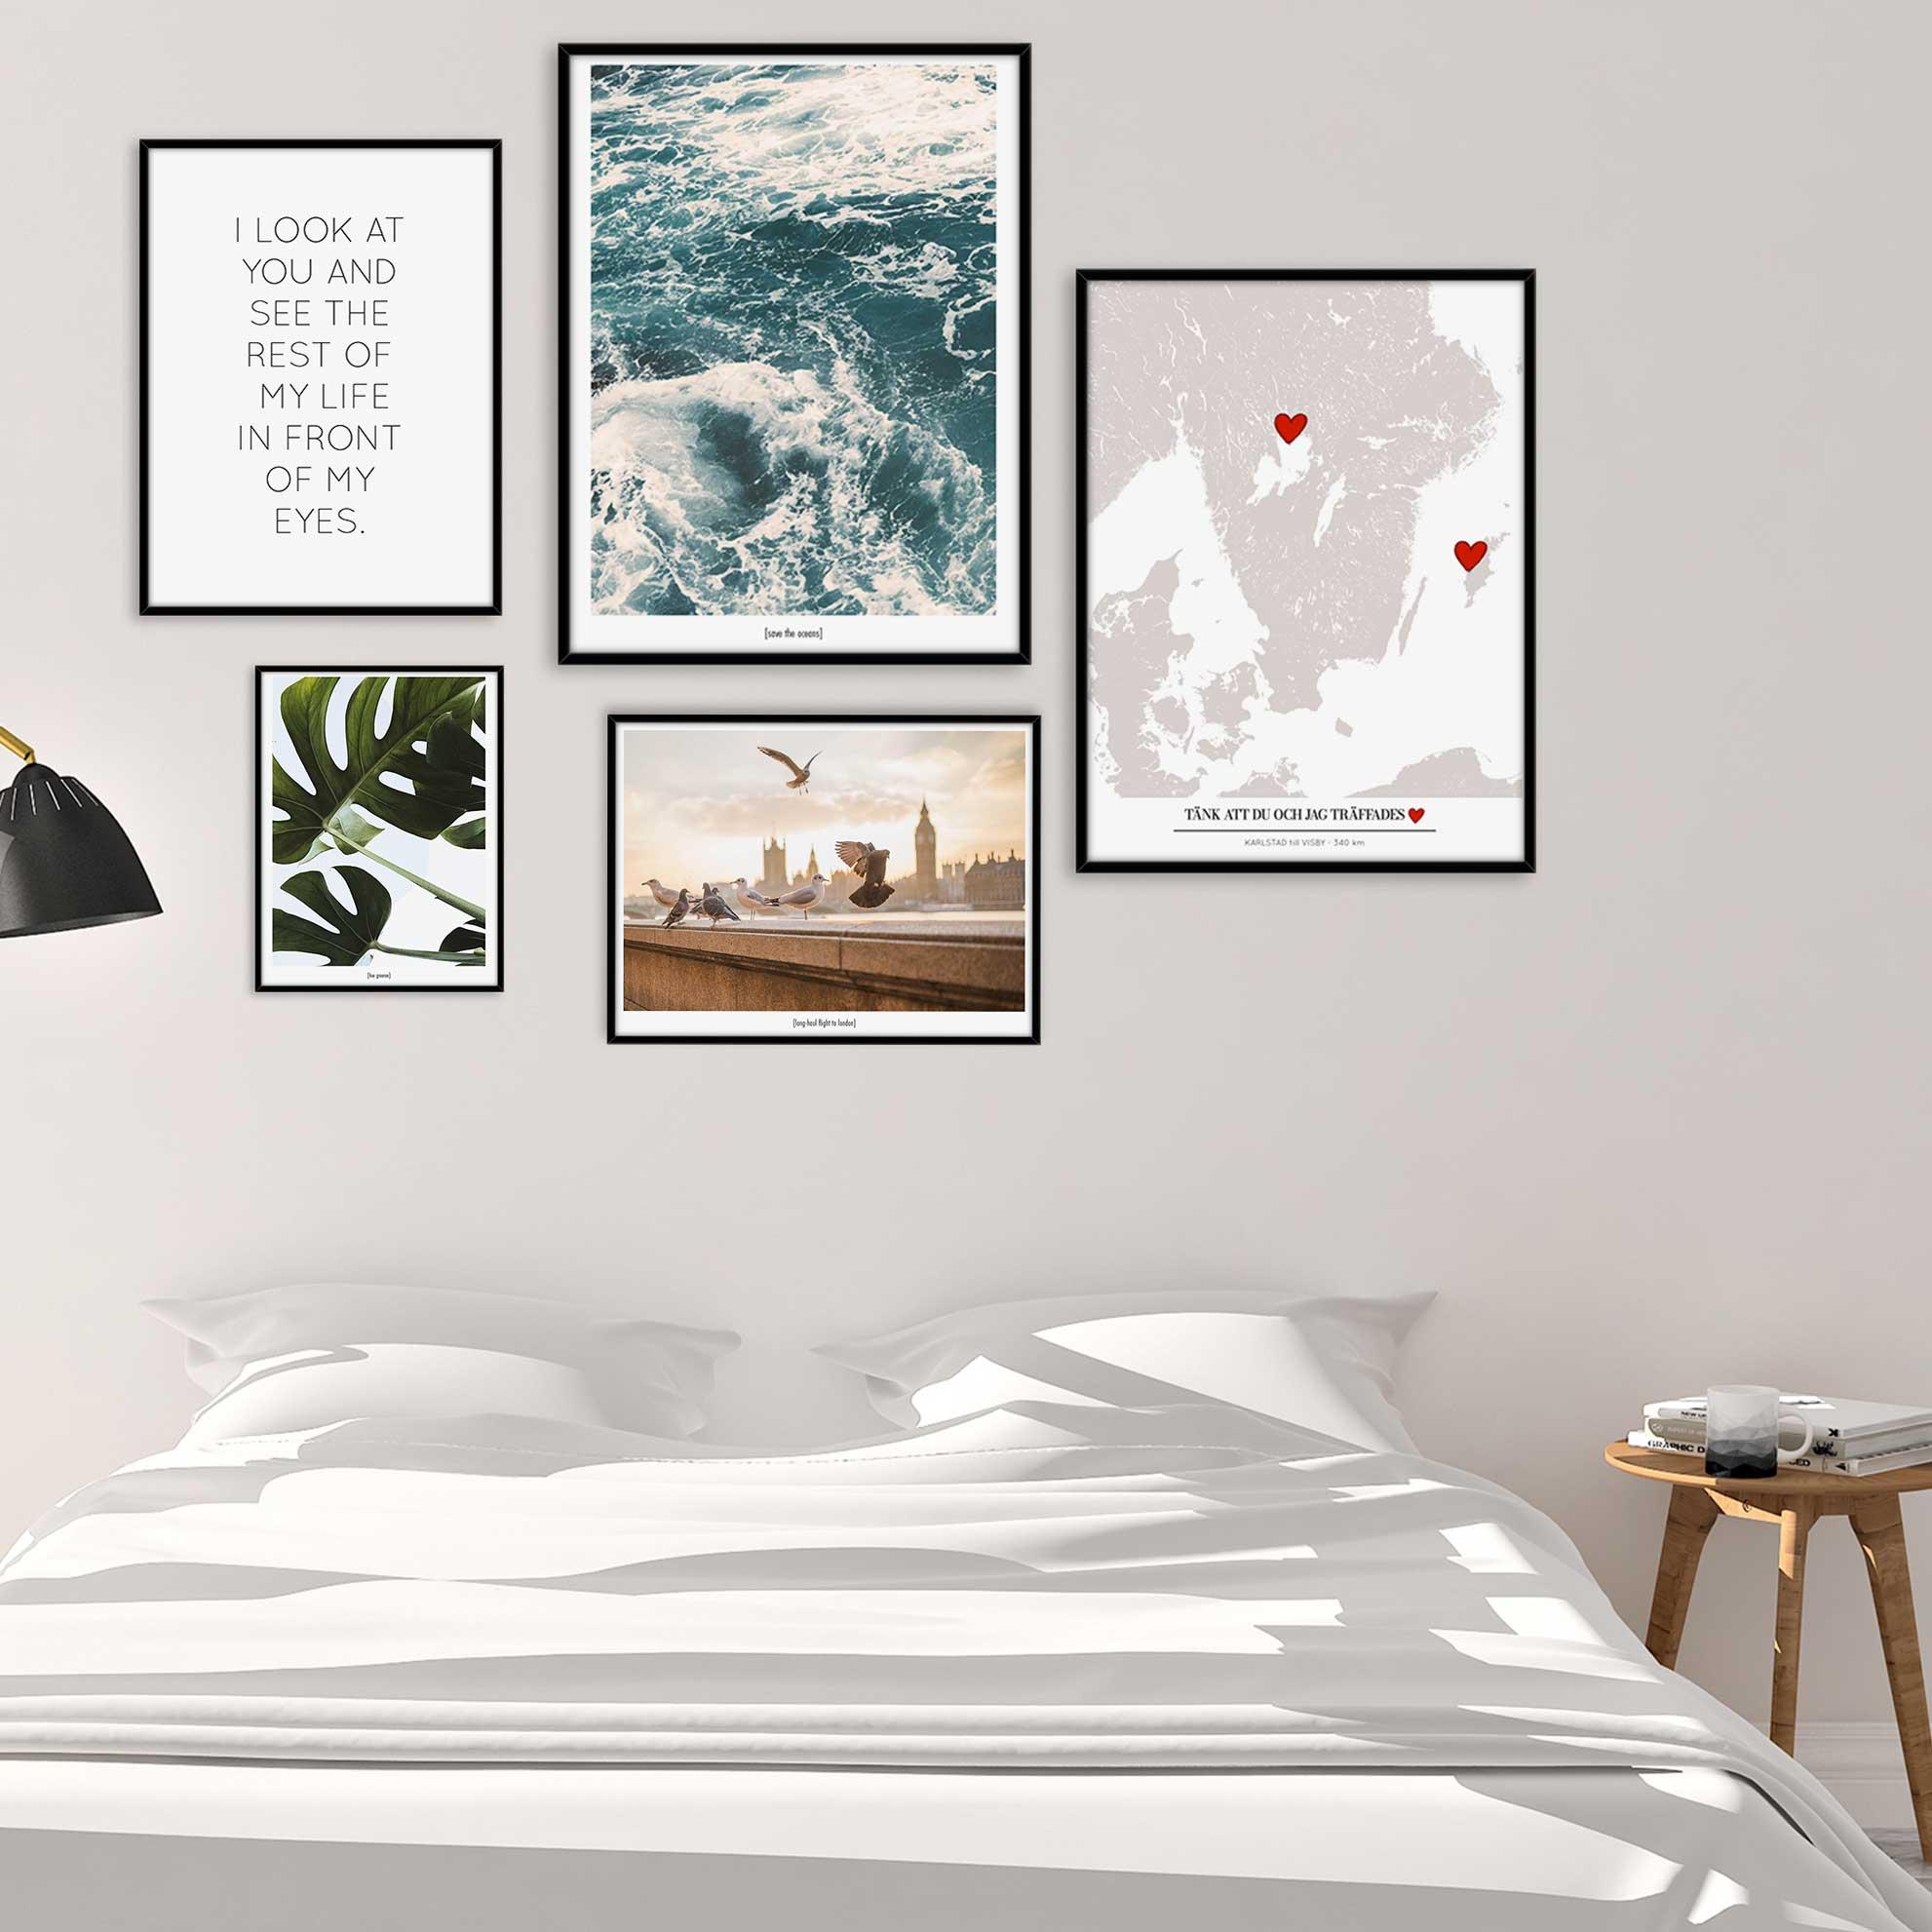 Tavelvägg sovrum inspiration